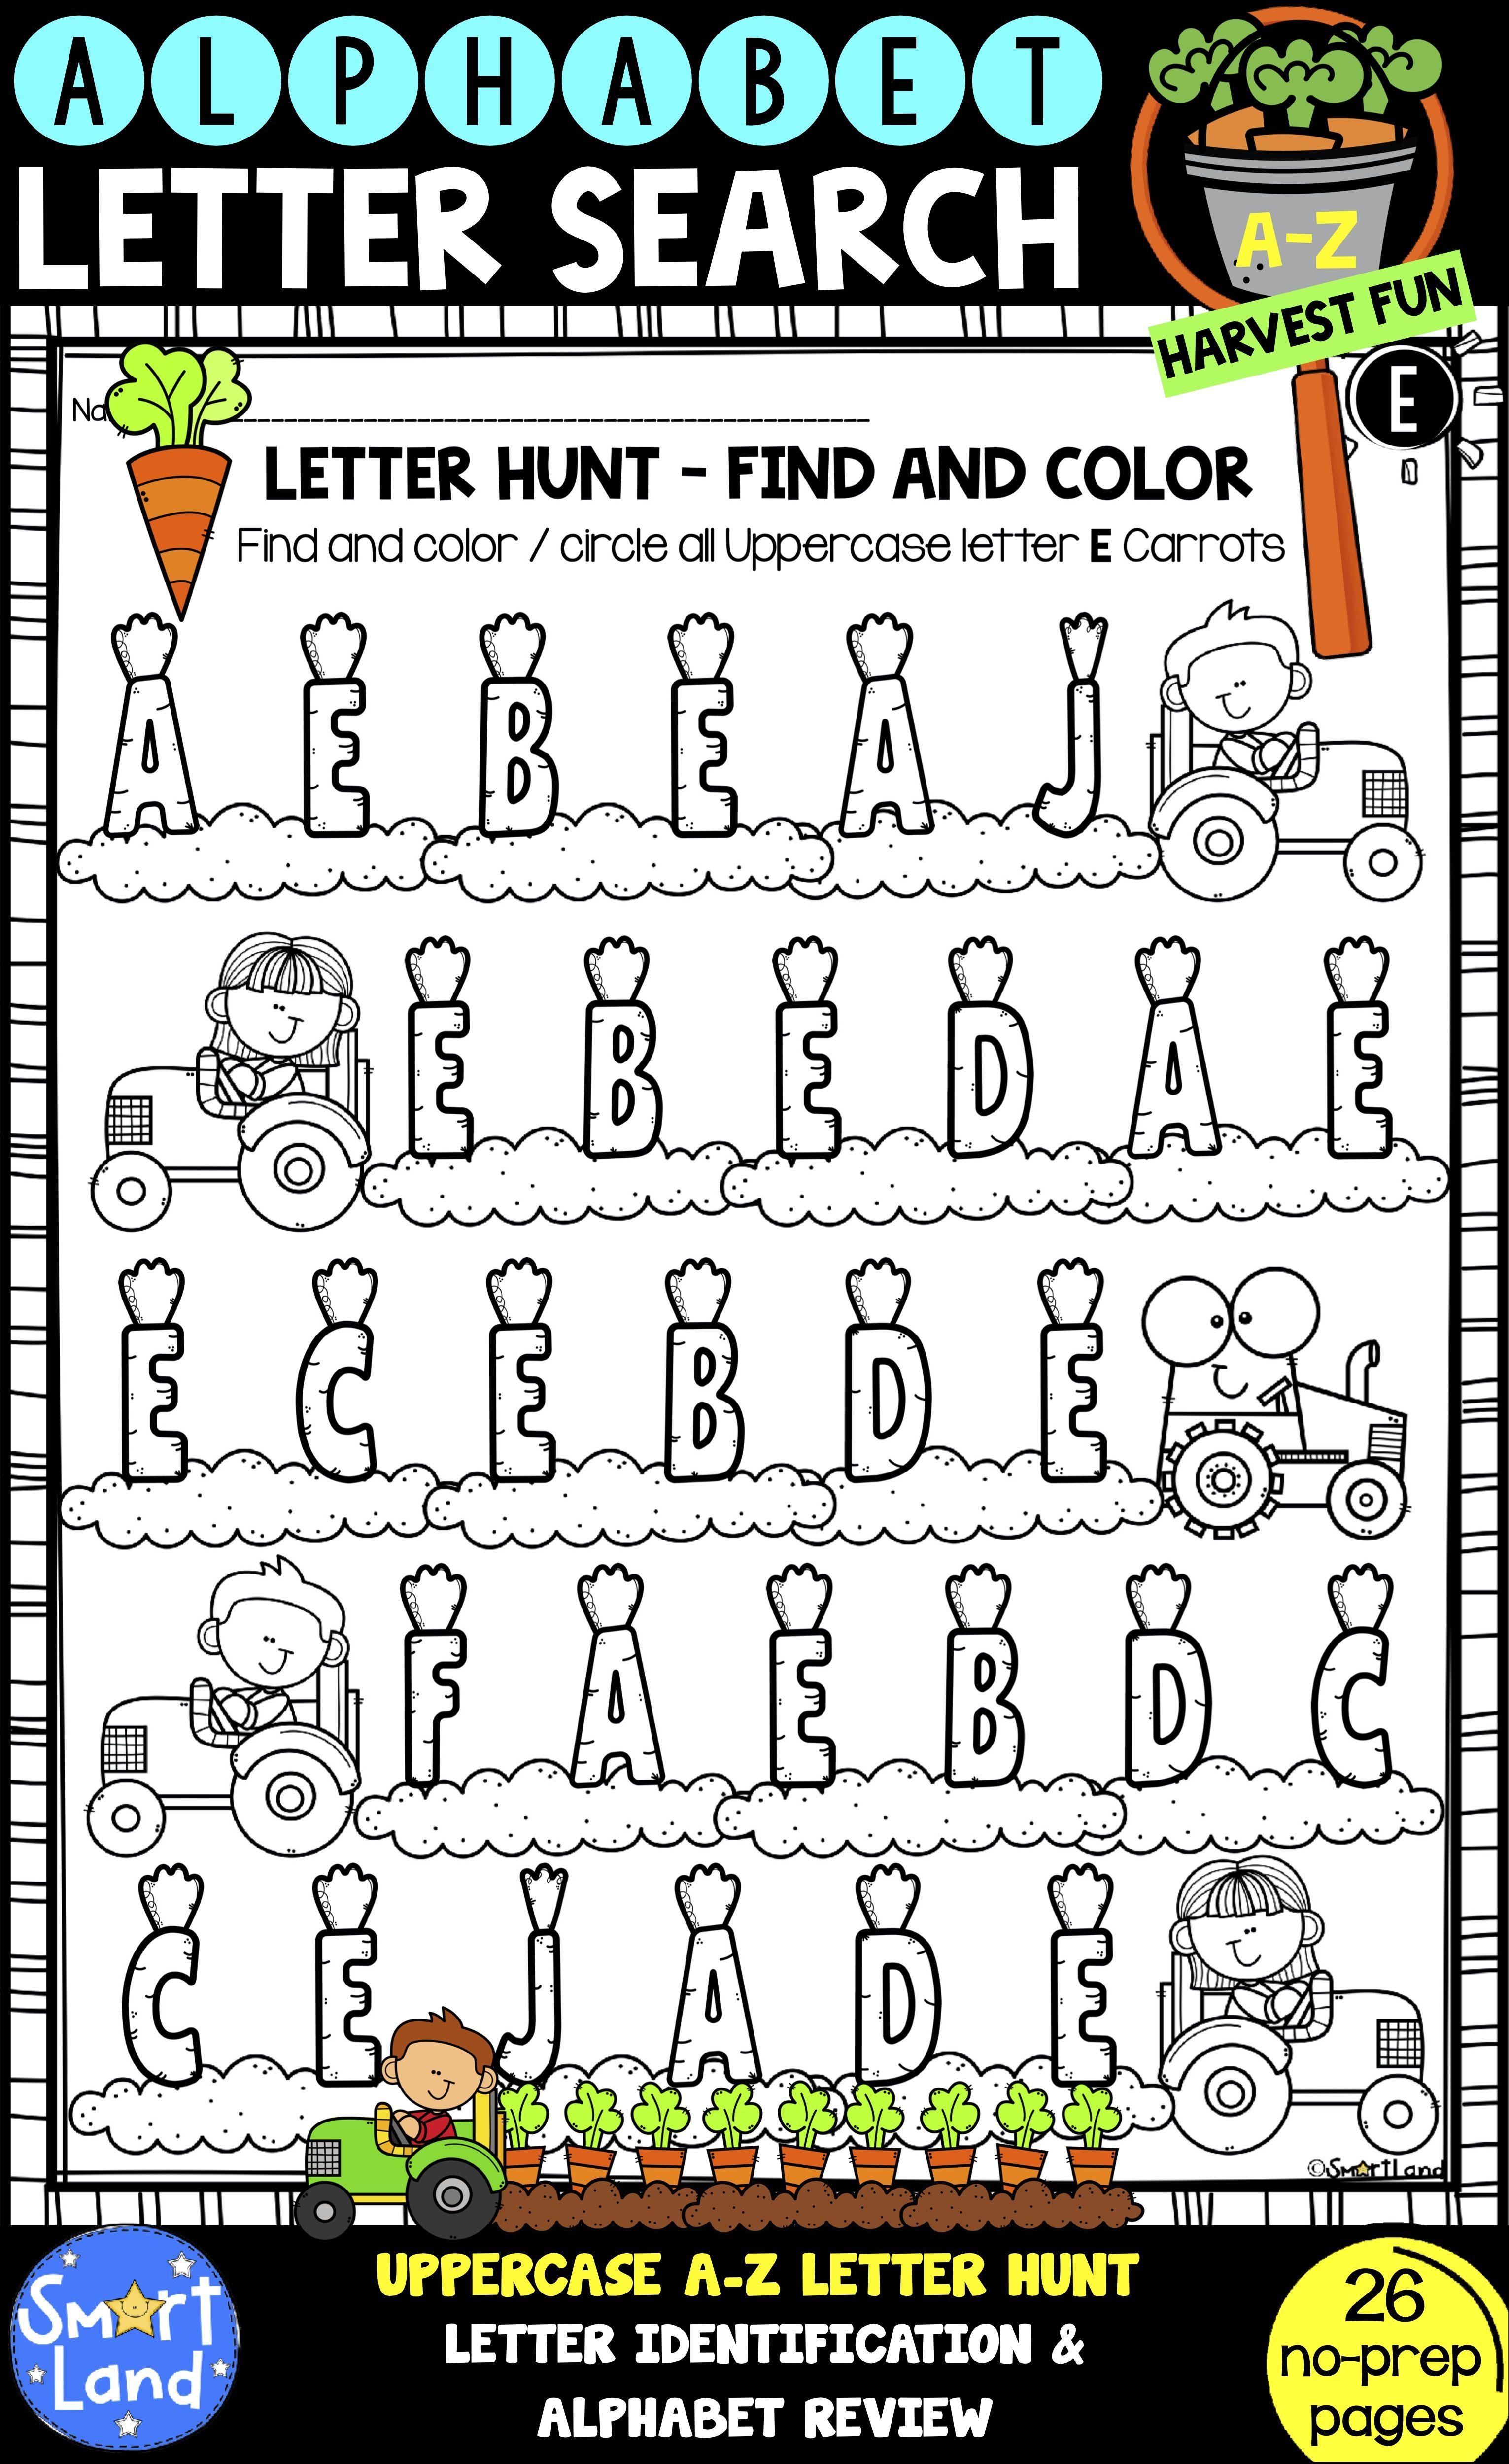 Alphabet Practice Worksheets Letter Search Harvest Fun Alphabet Practice Alphabet Practice Worksheets Lettering